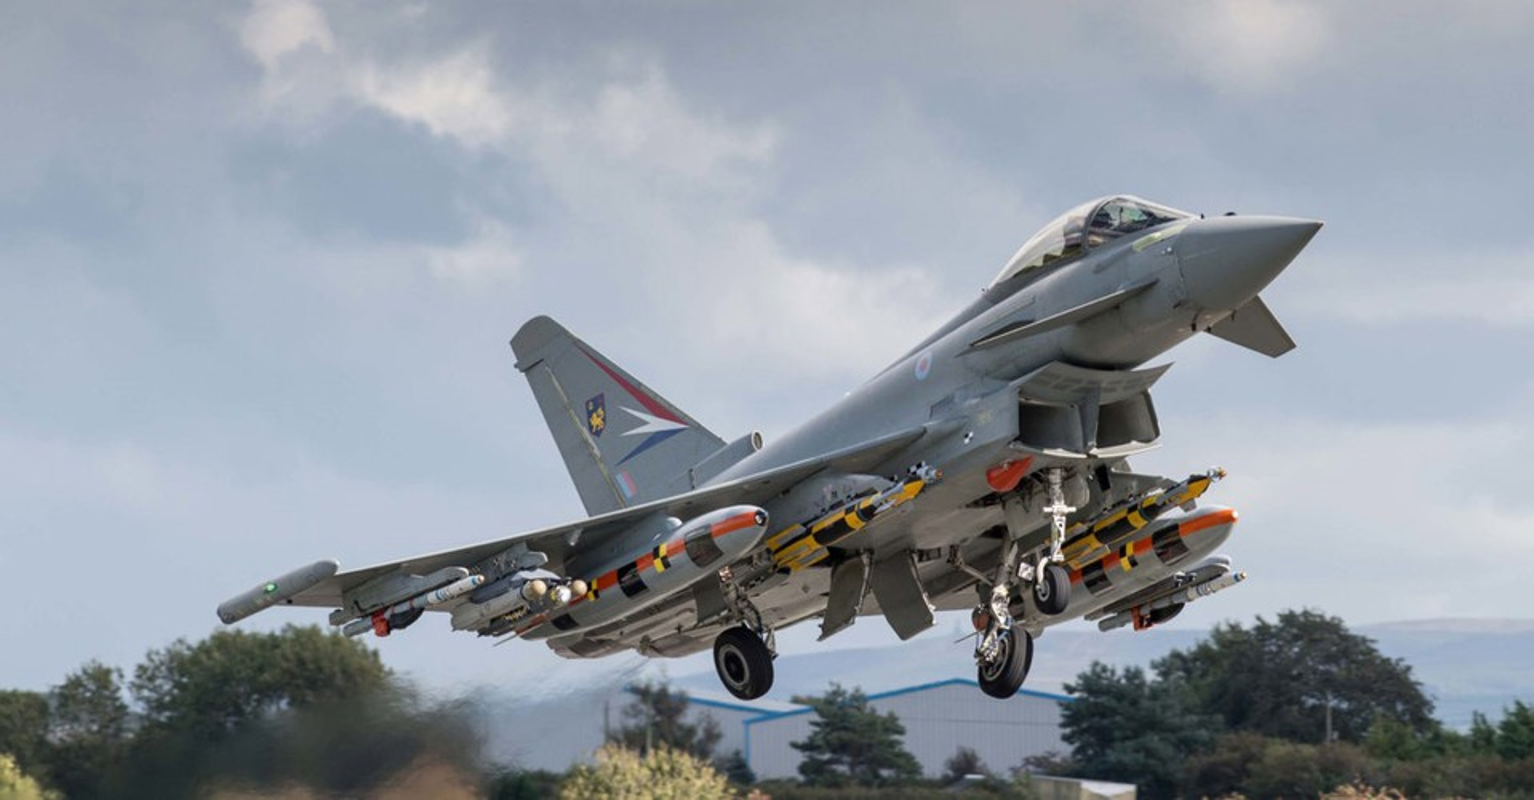 Quan tam Eurofighter Typhoon cua Ao, Indonesia huy hop dong mua Su-35 Nga?-Hinh-10